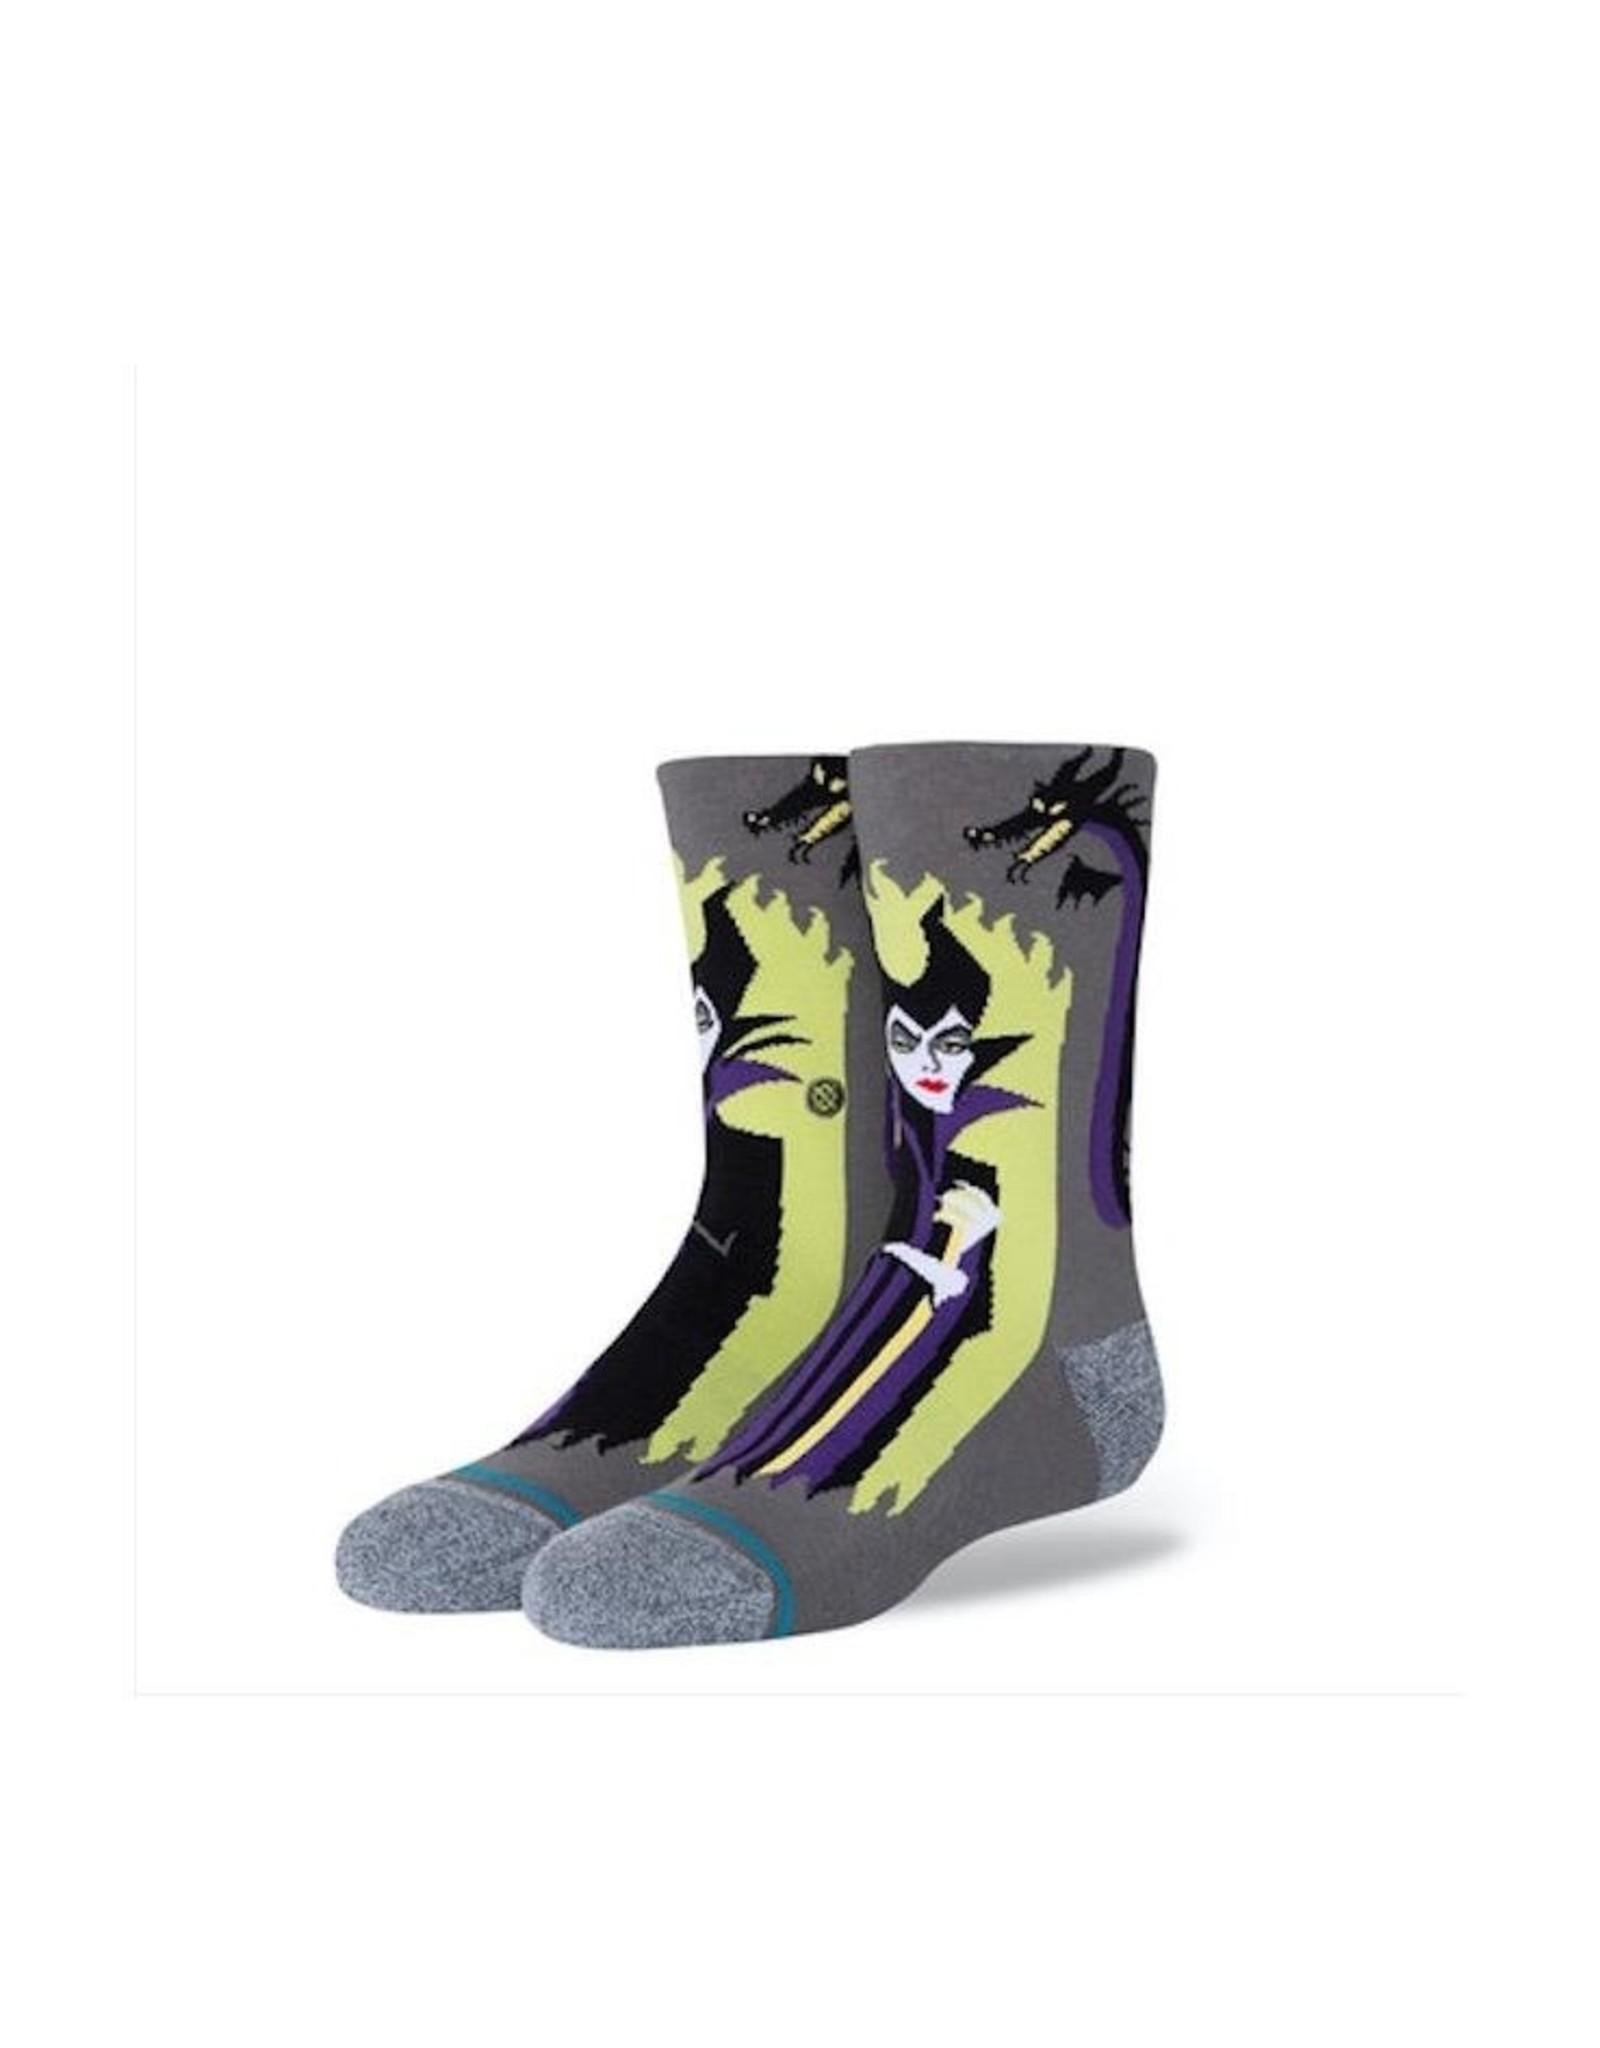 Stance Socks Disney Infiknit Socks, Maleficent